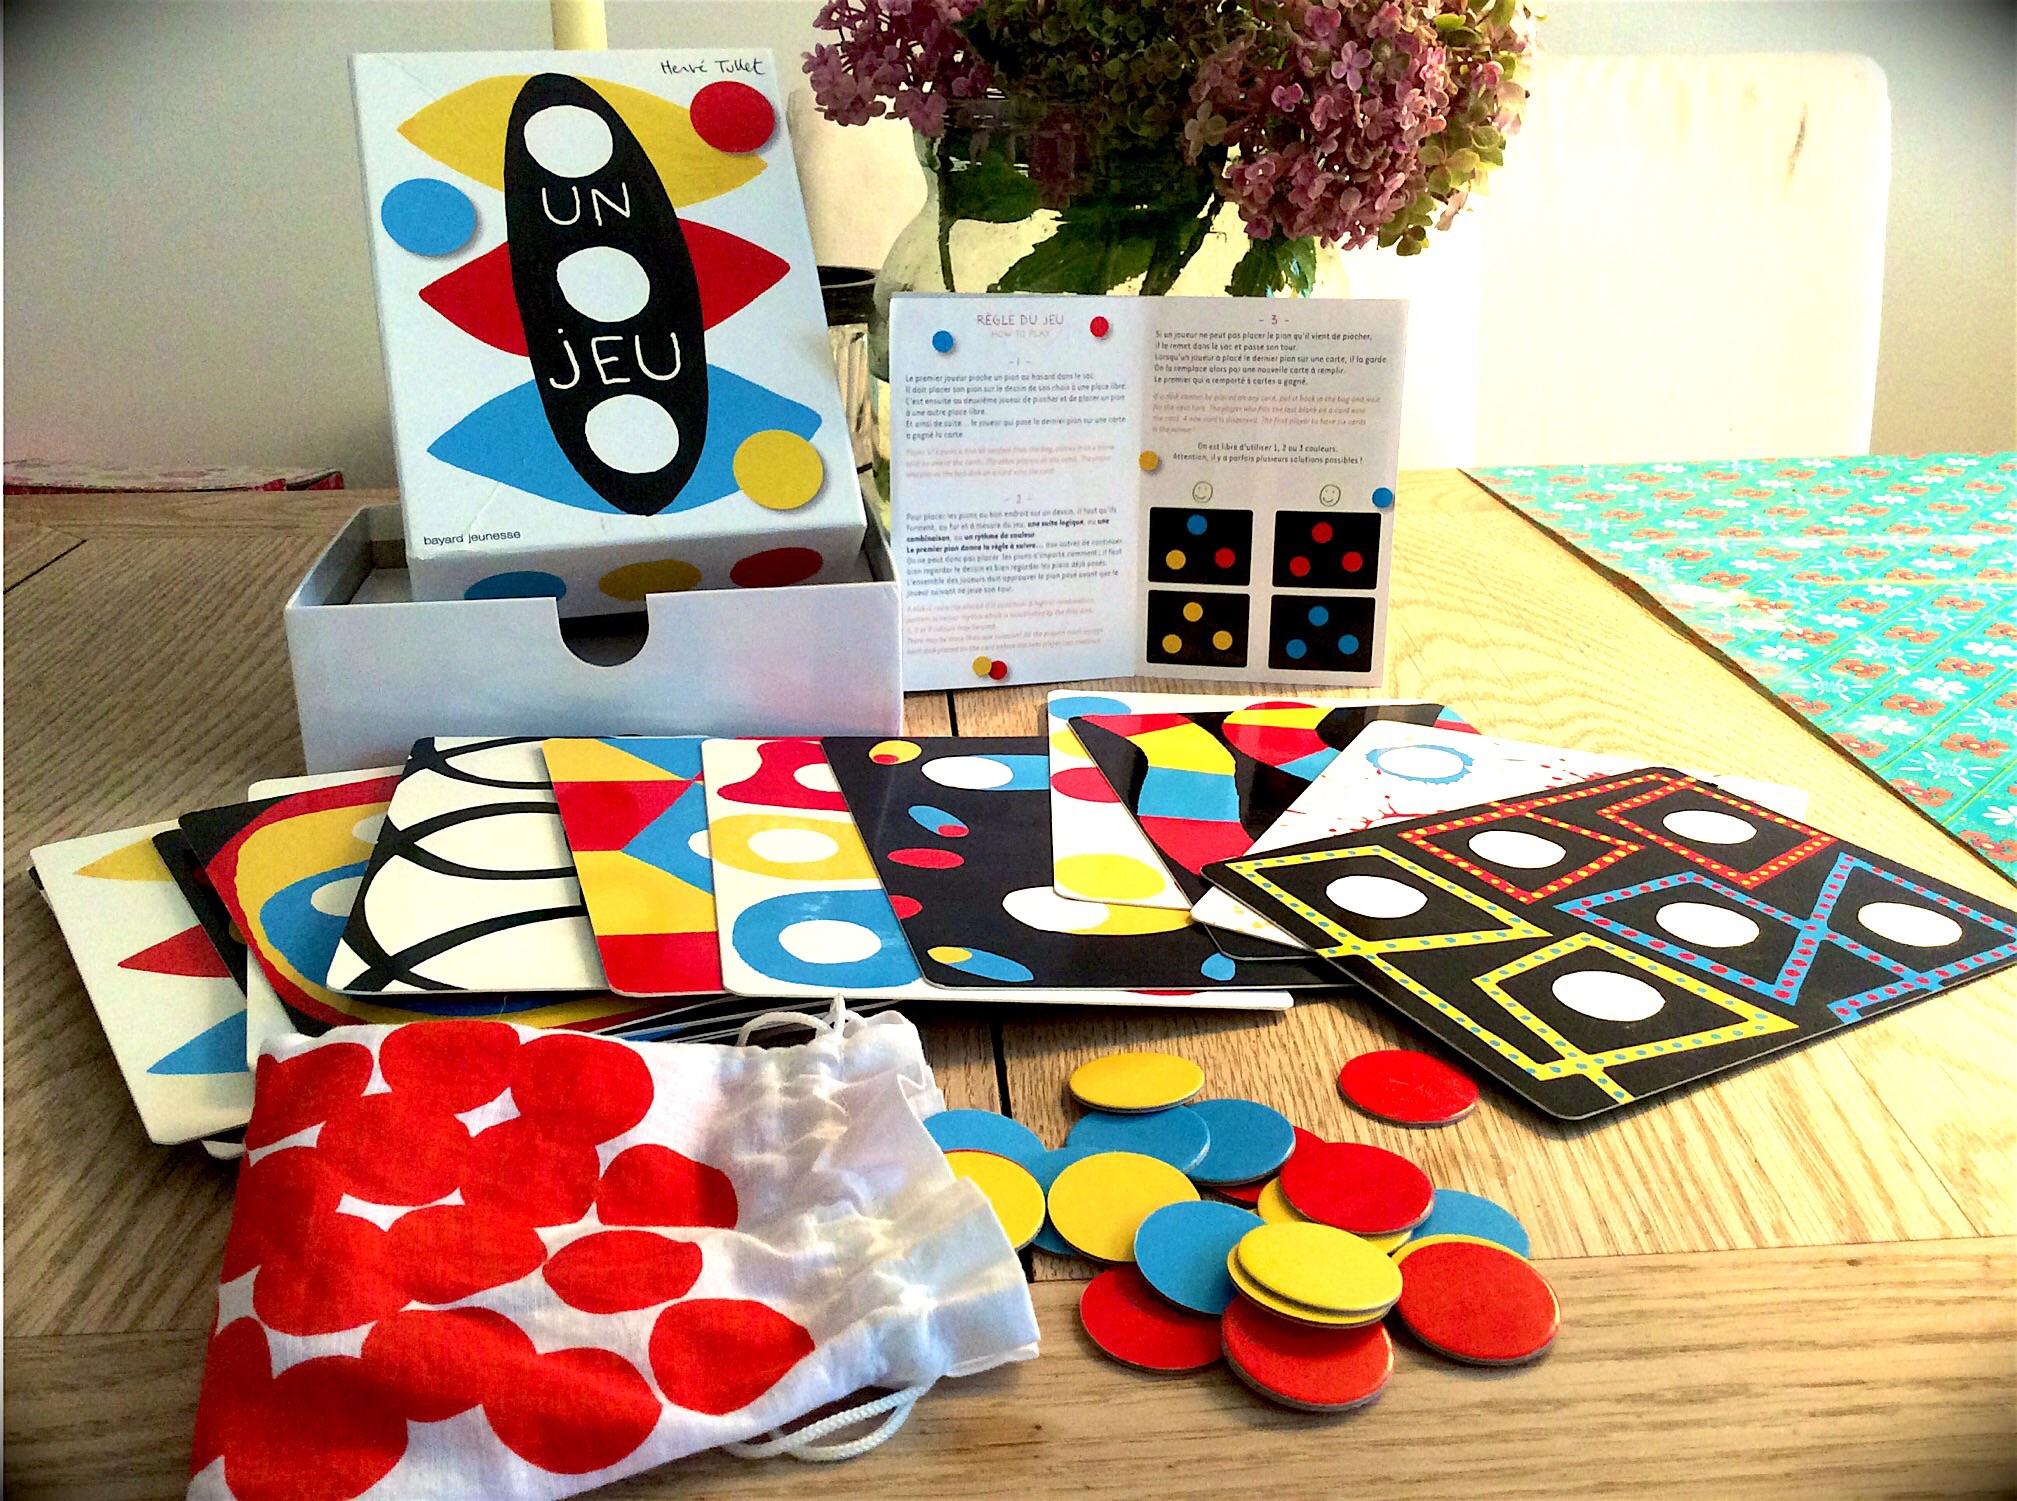 le jeu de logique cr par le g nial artiste herv tullet. Black Bedroom Furniture Sets. Home Design Ideas